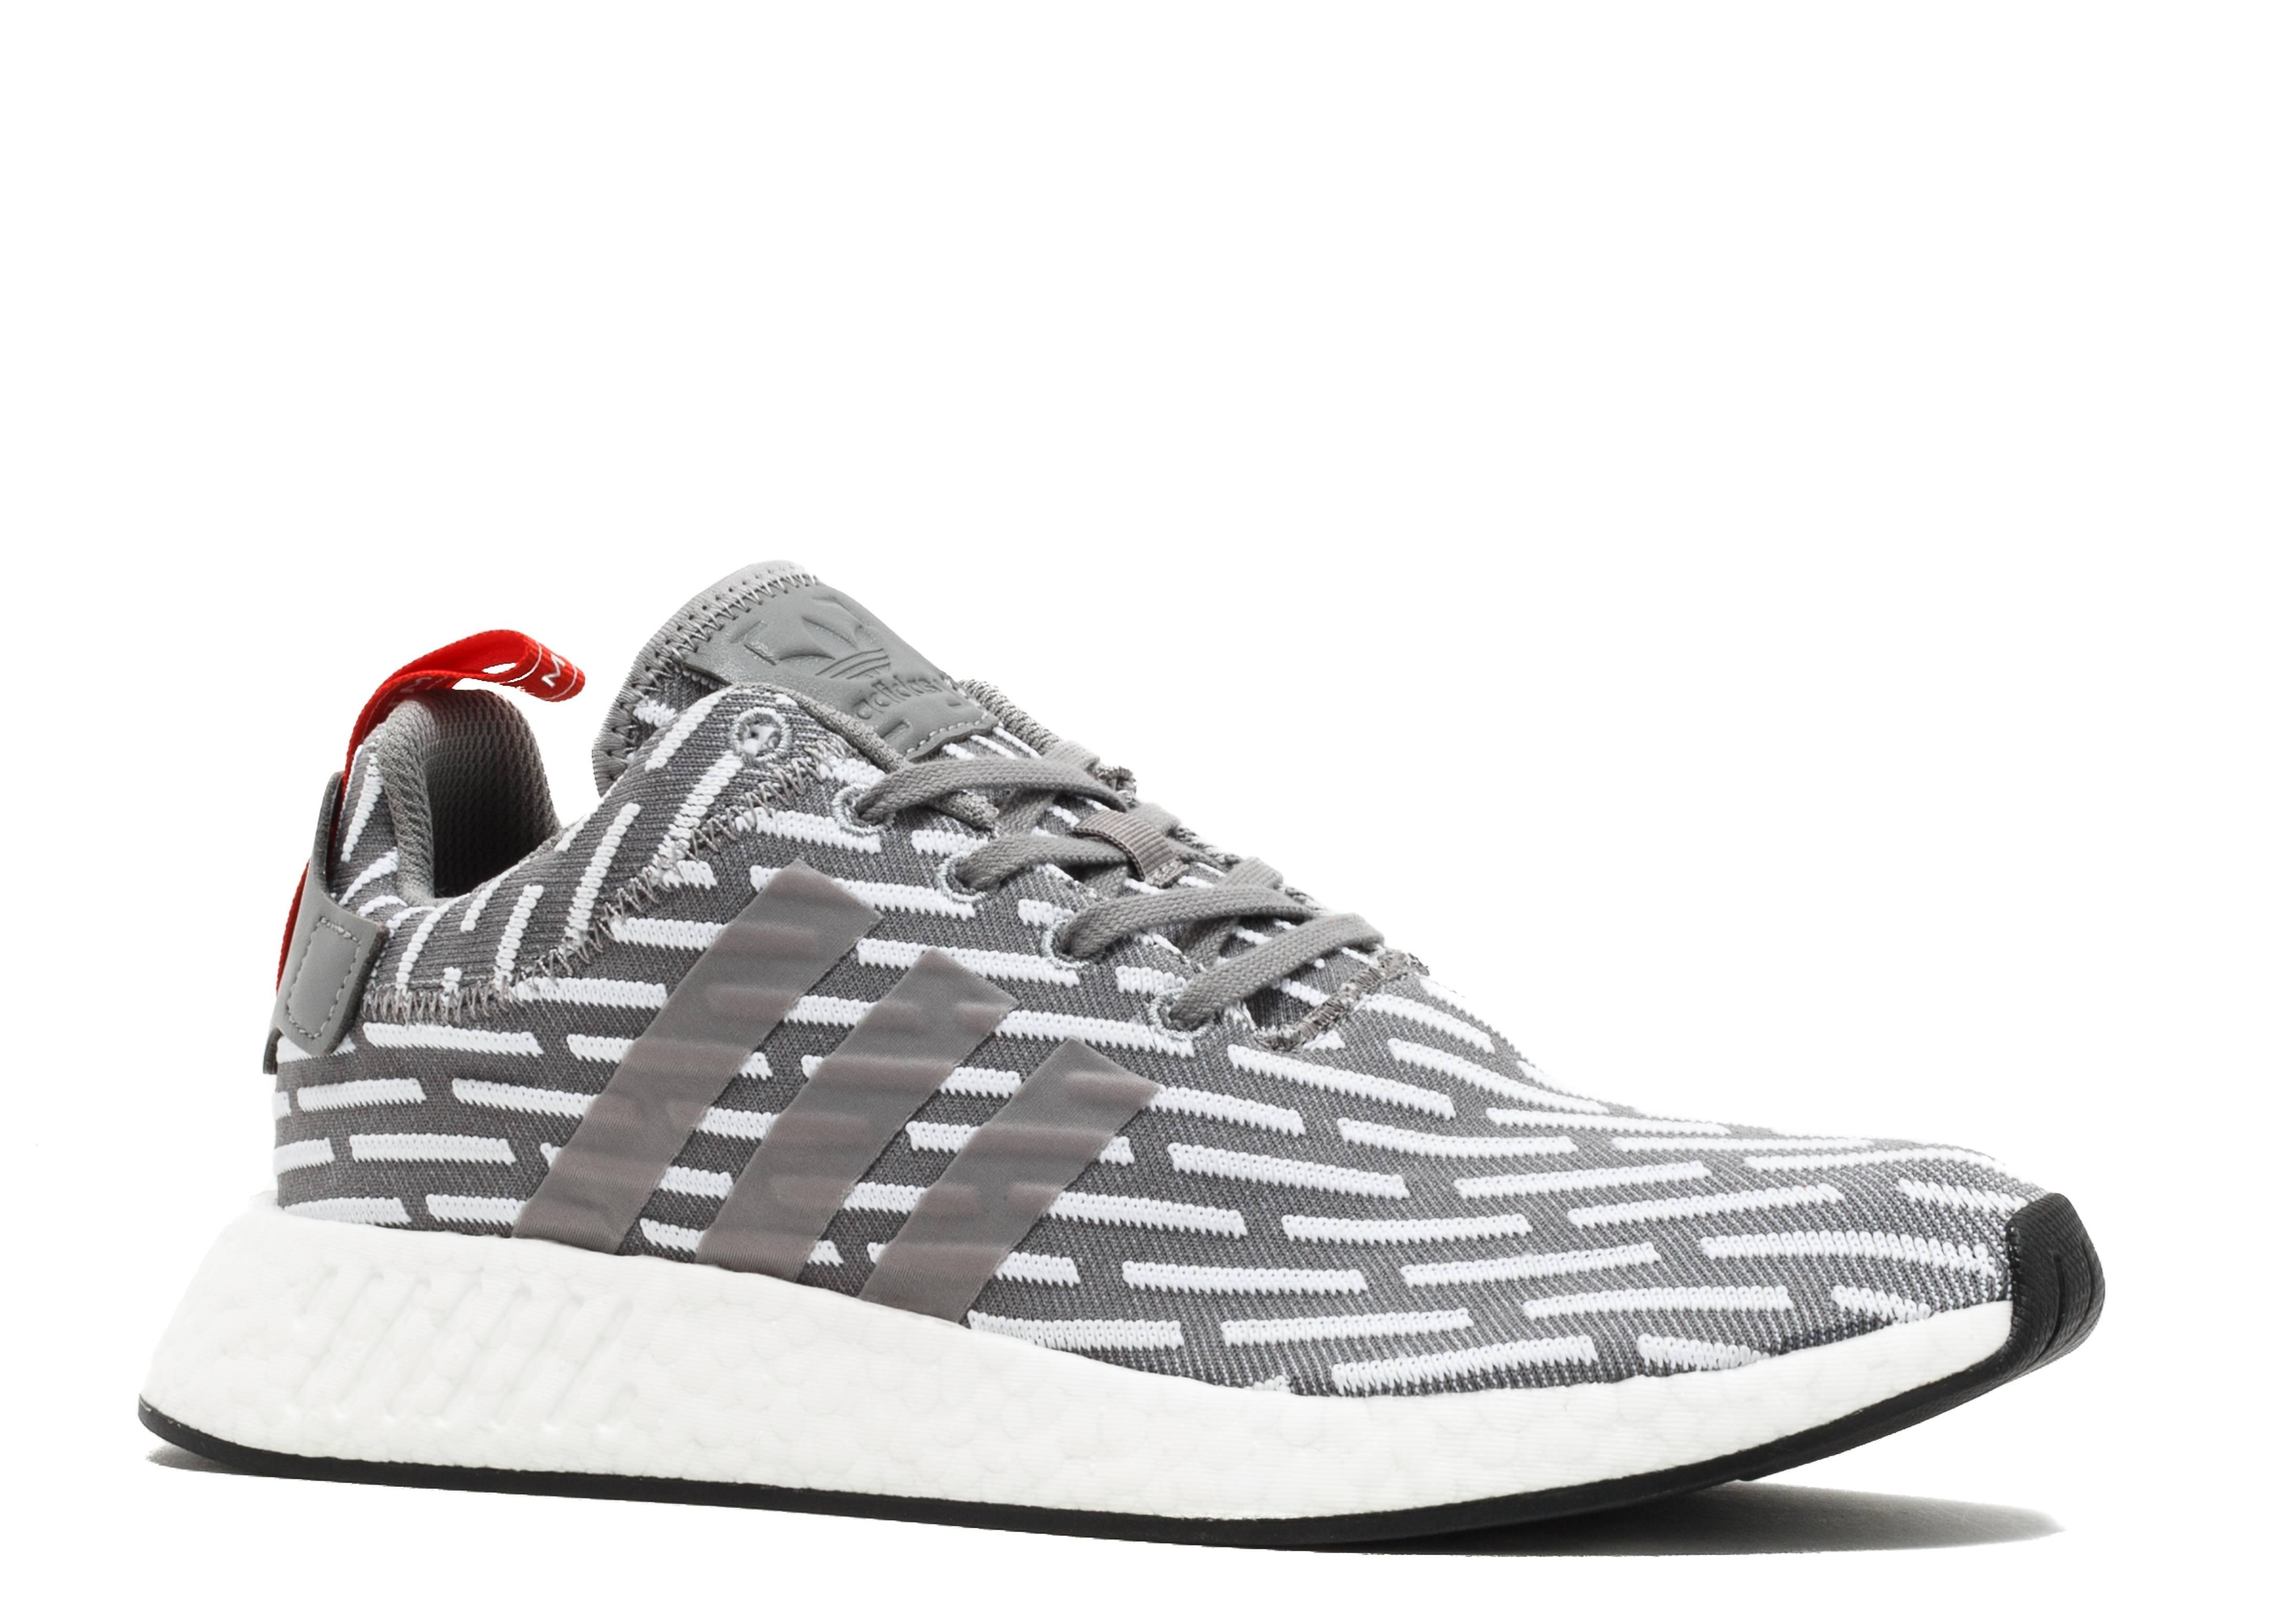 35c8dab76 Kick Avenue - Authentic Sneakers